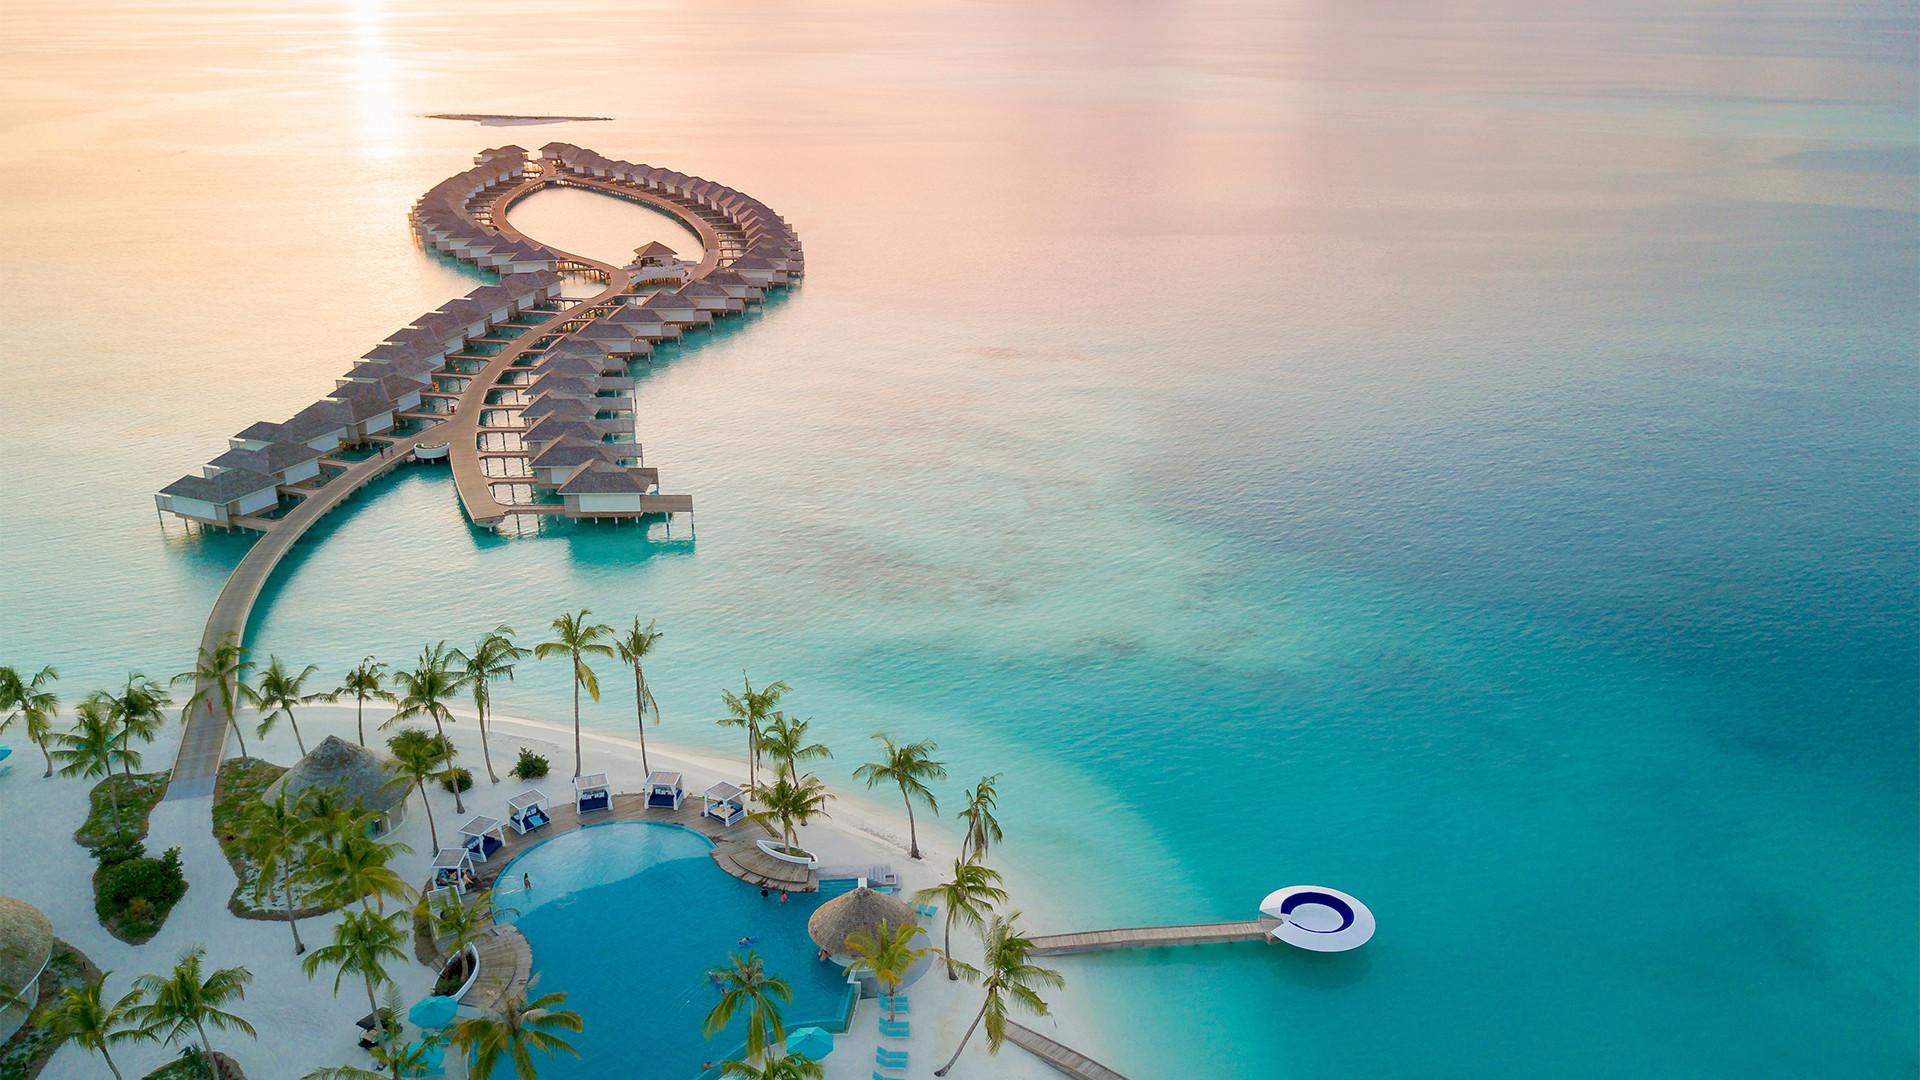 Kandima Resort in the Maldives